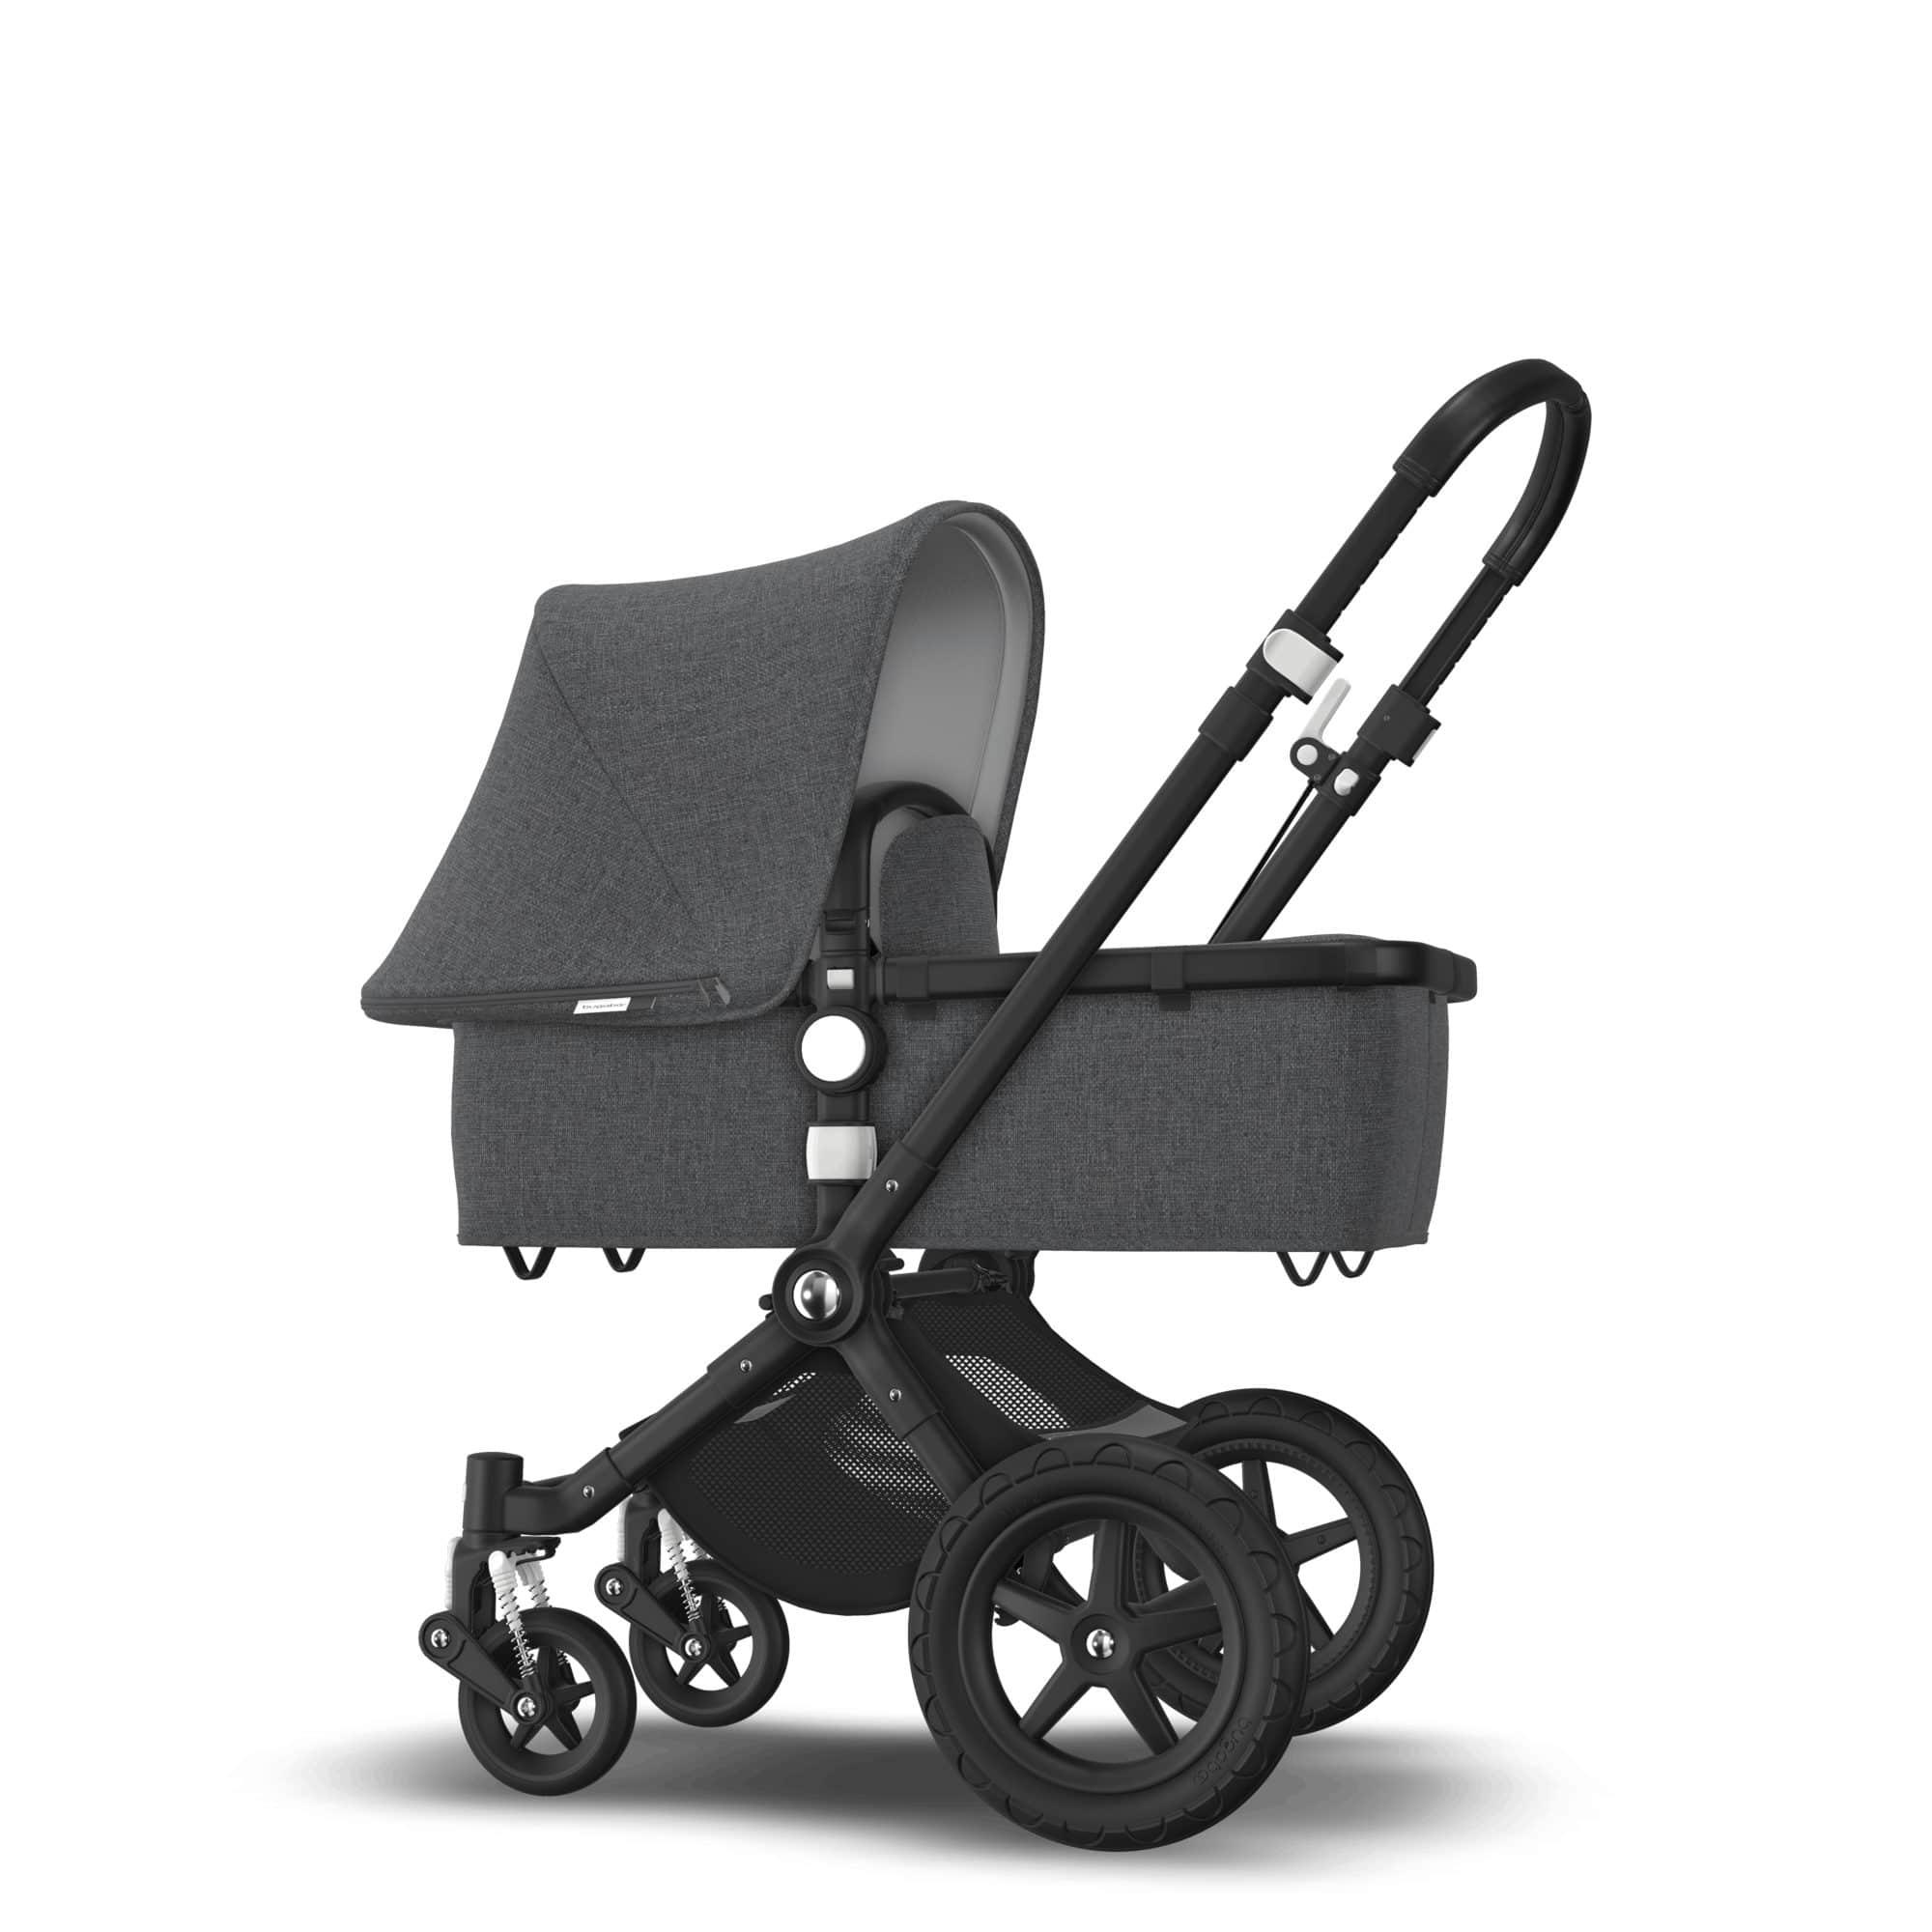 extra-pi-bgb-cam3-chassis-zw-bassinet-gm-sun-canopy-gm-grips-zw